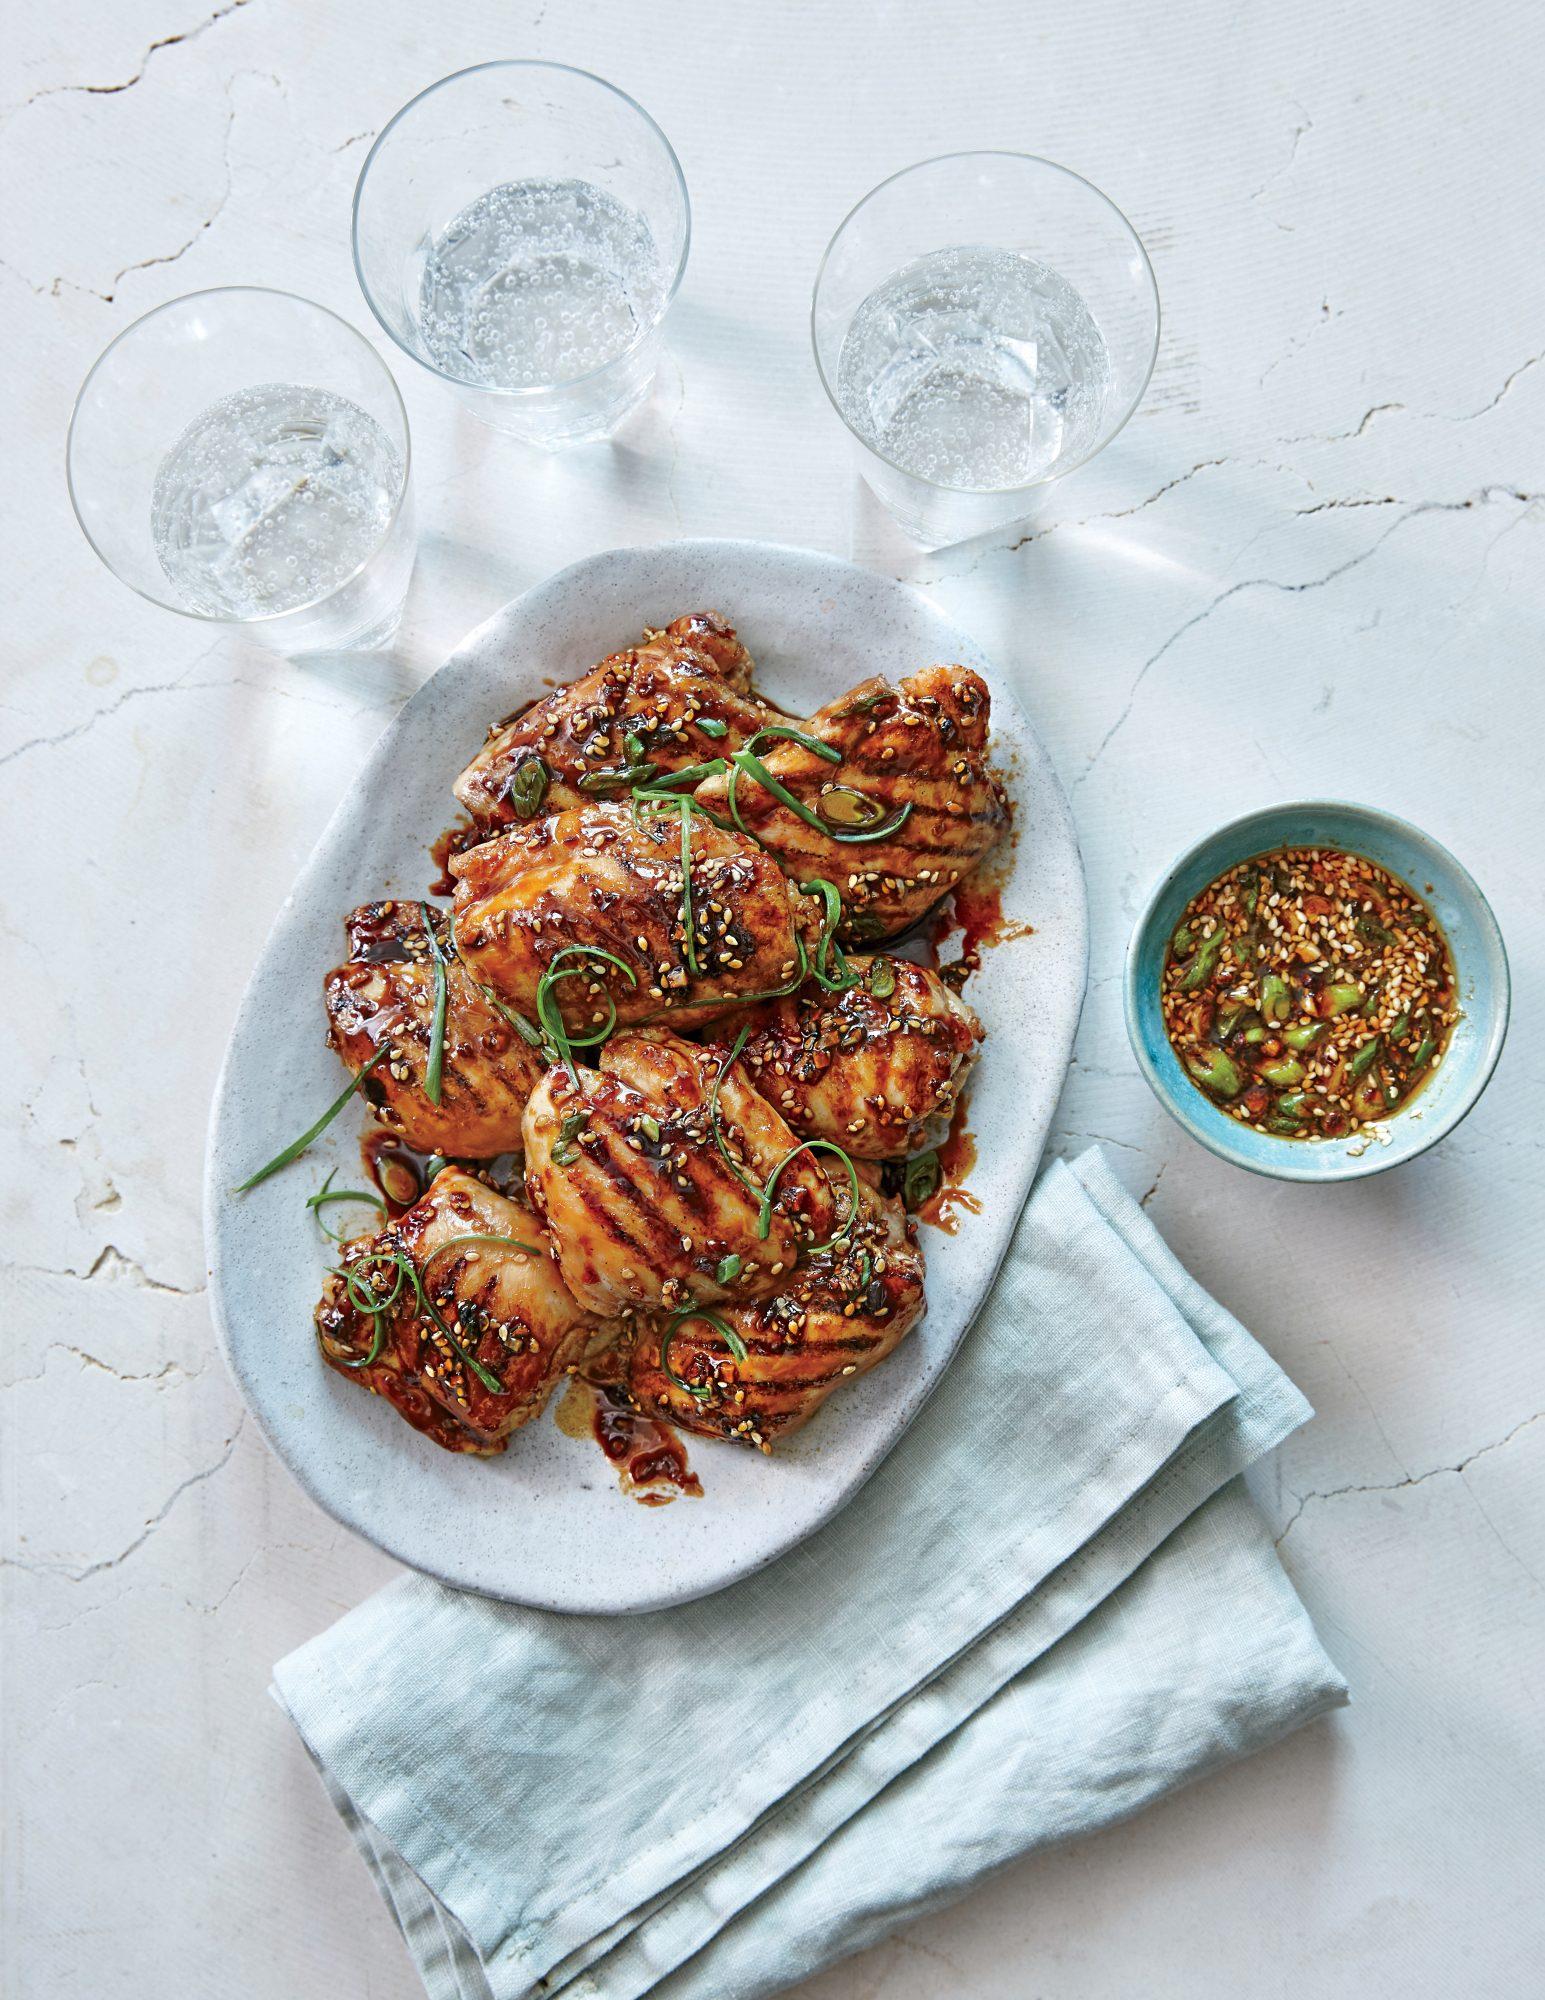 Chicken Thighs with Ginger-Sesame Glaze